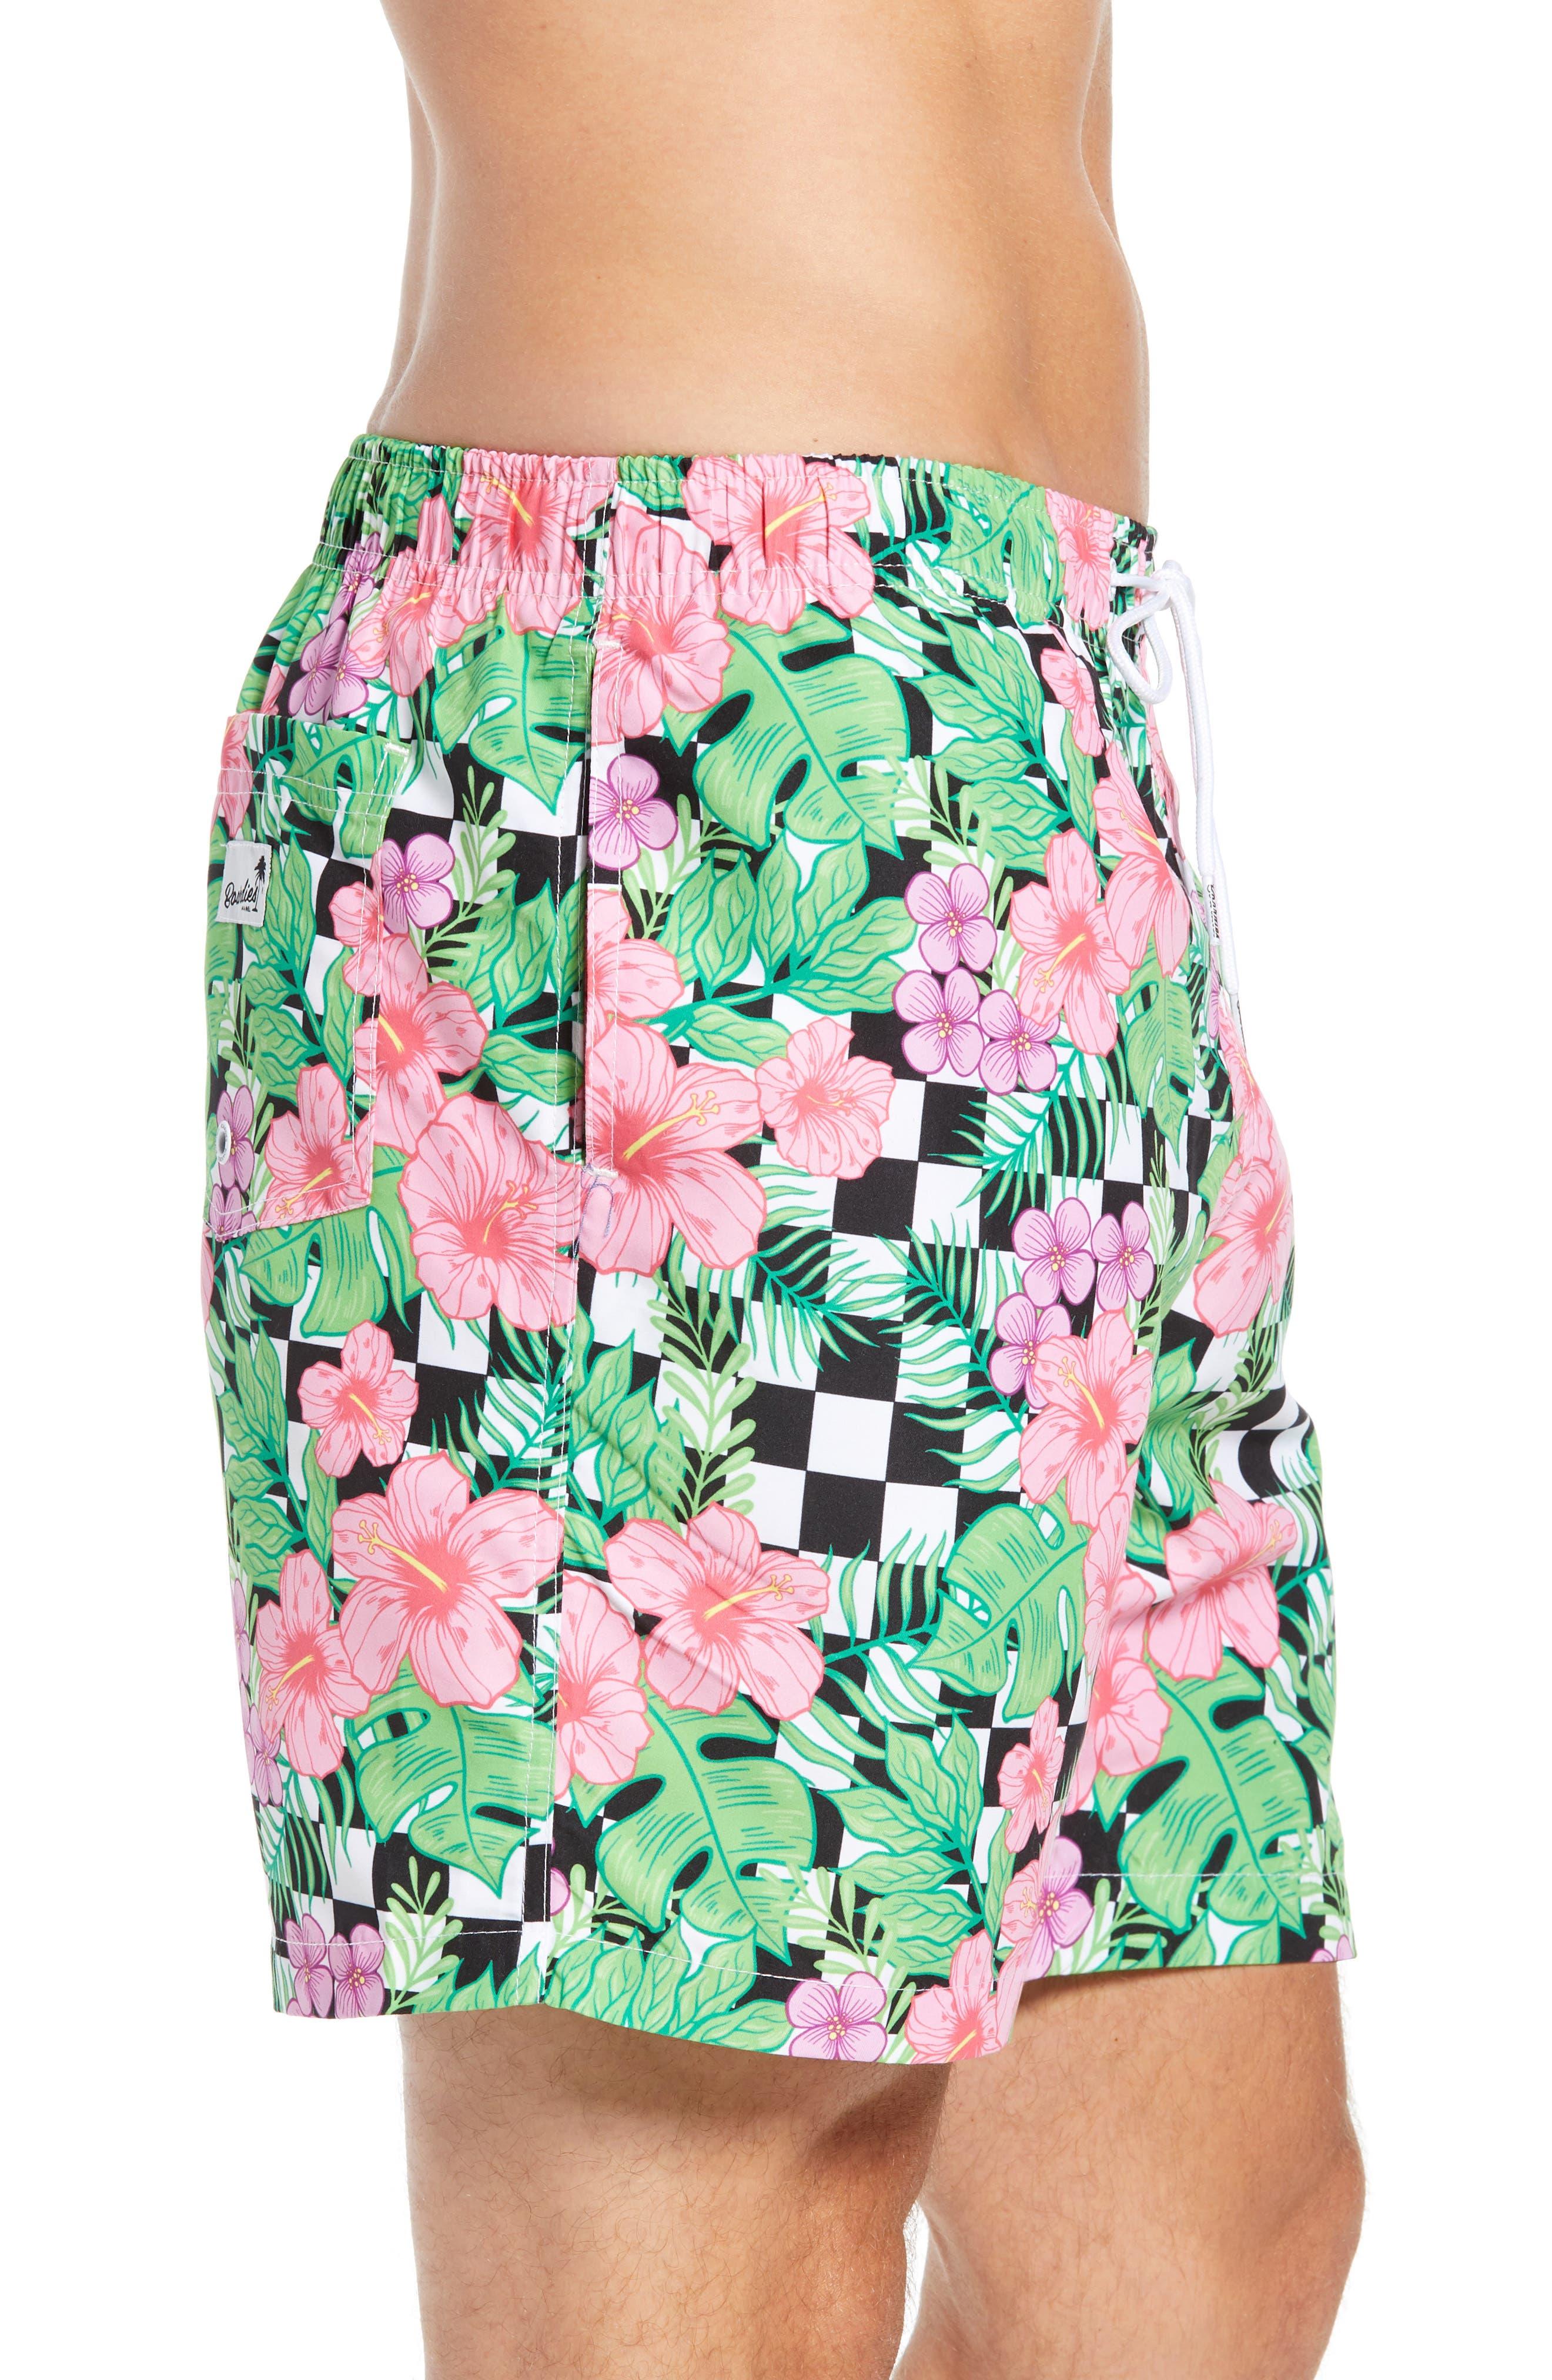 Checkerboard Floral Print Swim Trunks,                             Alternate thumbnail 3, color,                             MULTI